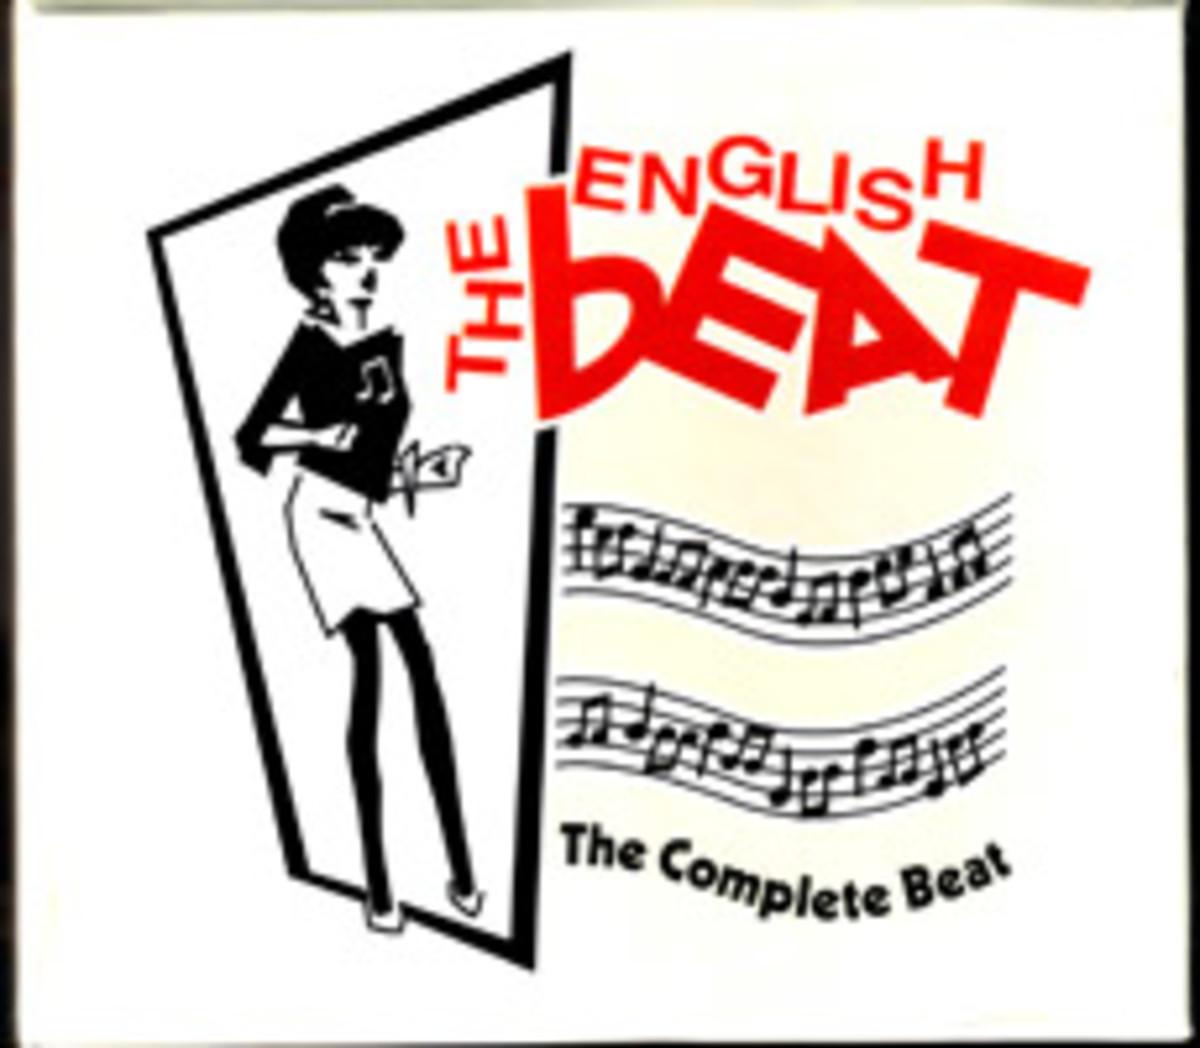 English Beat box set from Shout Factory